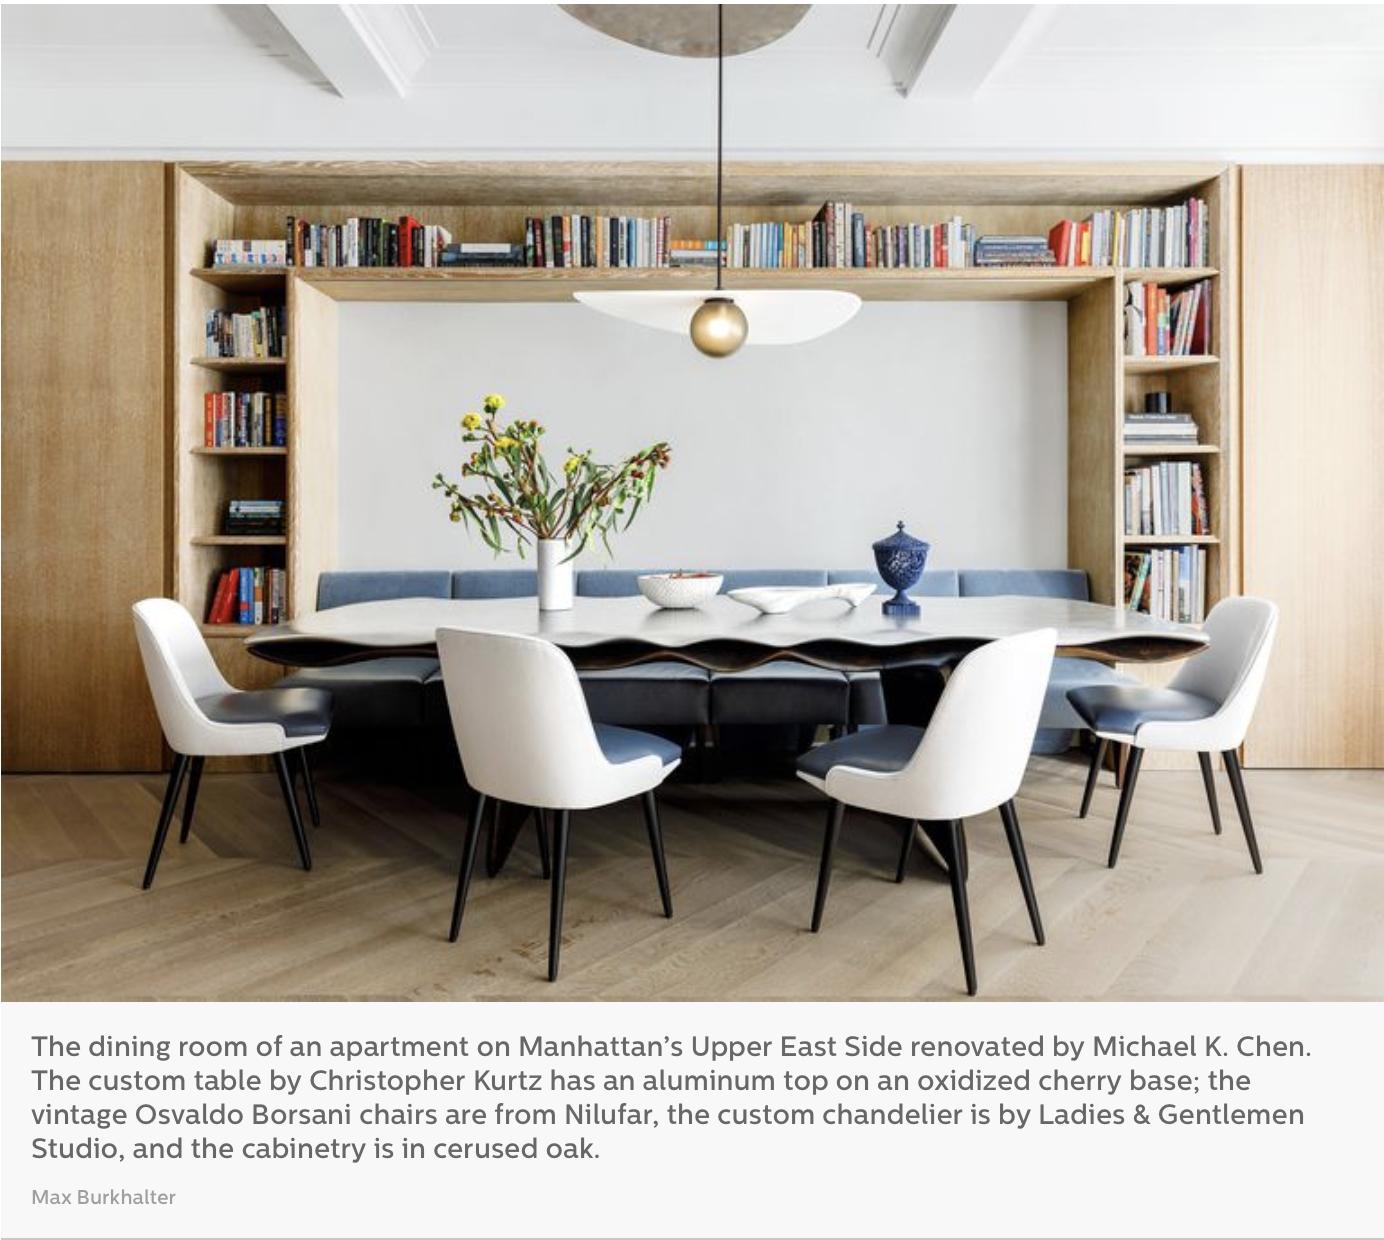 Christopher Kurtz's custom dining table featured in Elle Decor